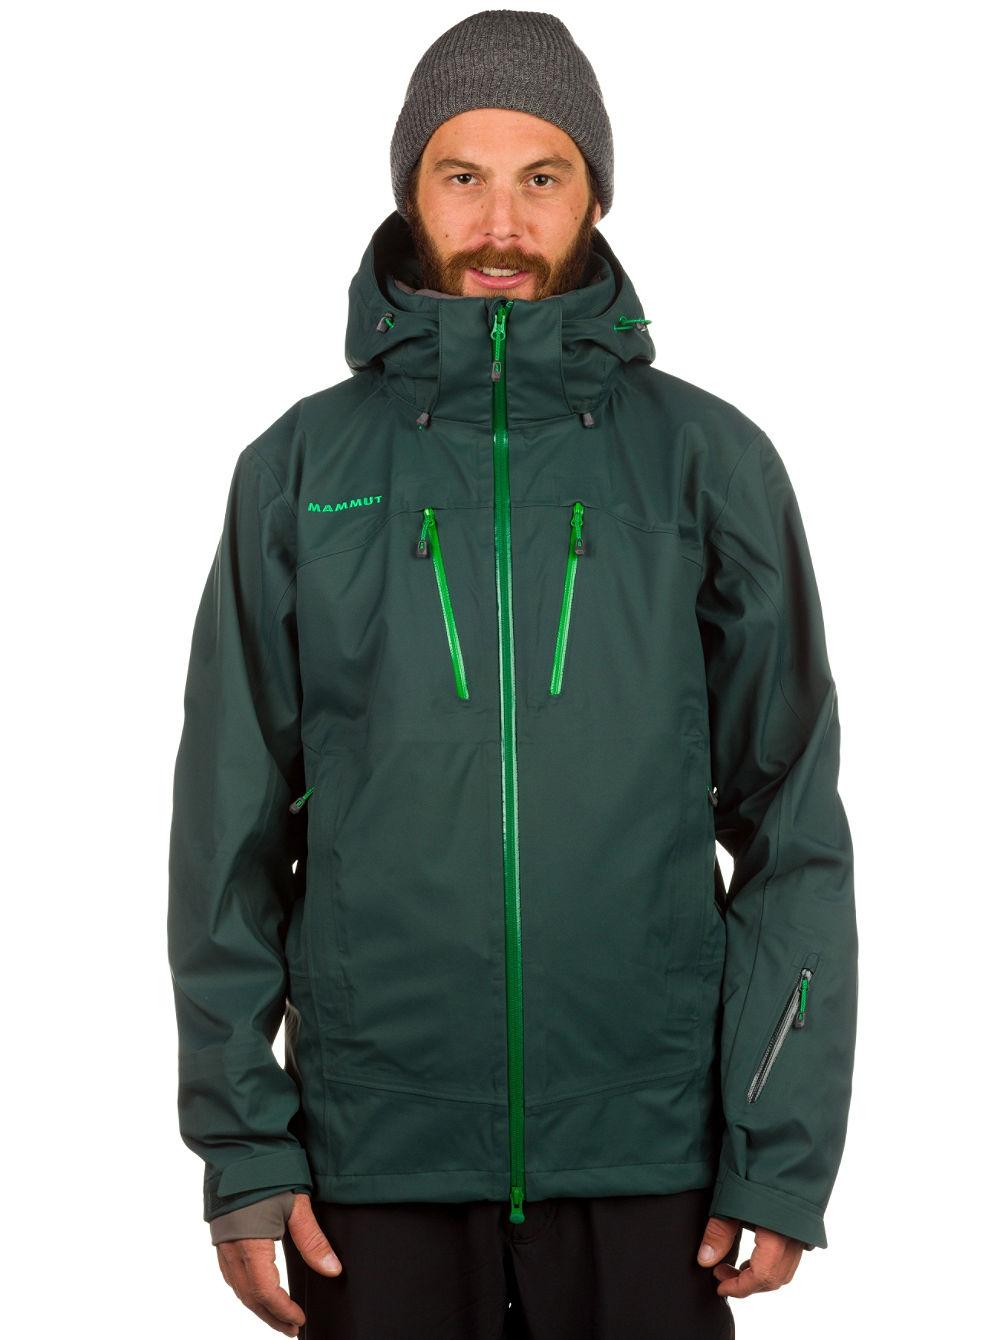 Buy Mammut Stoney Hs Jacket Online At Blue Tomato Com